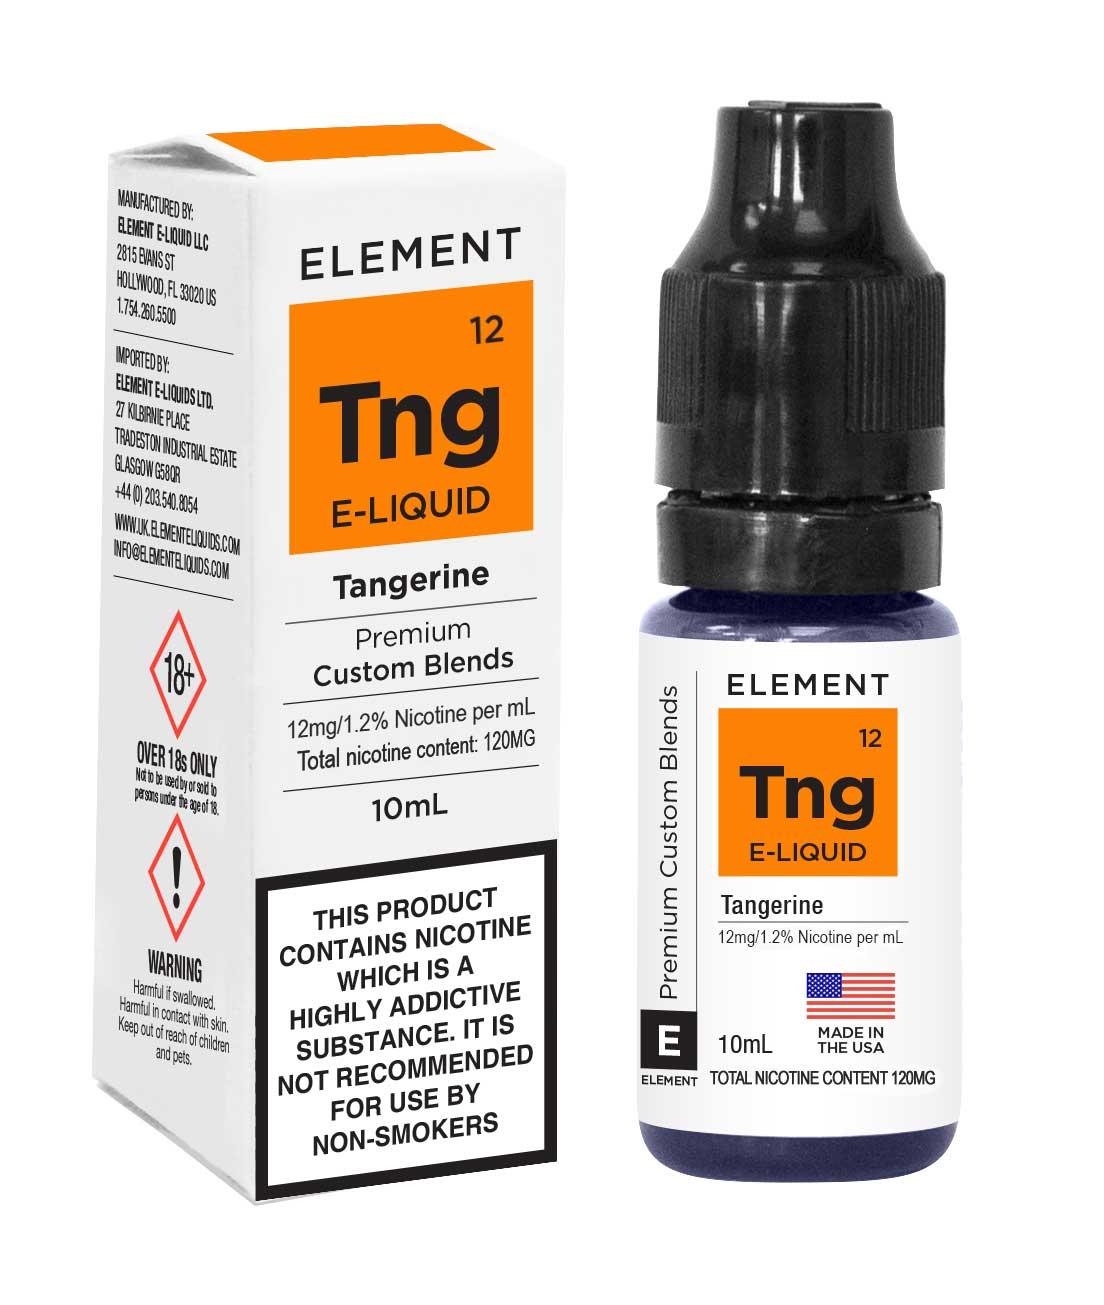 Compare prices for Element E-liquid Tangerine 10ml - 12mg Nicotine